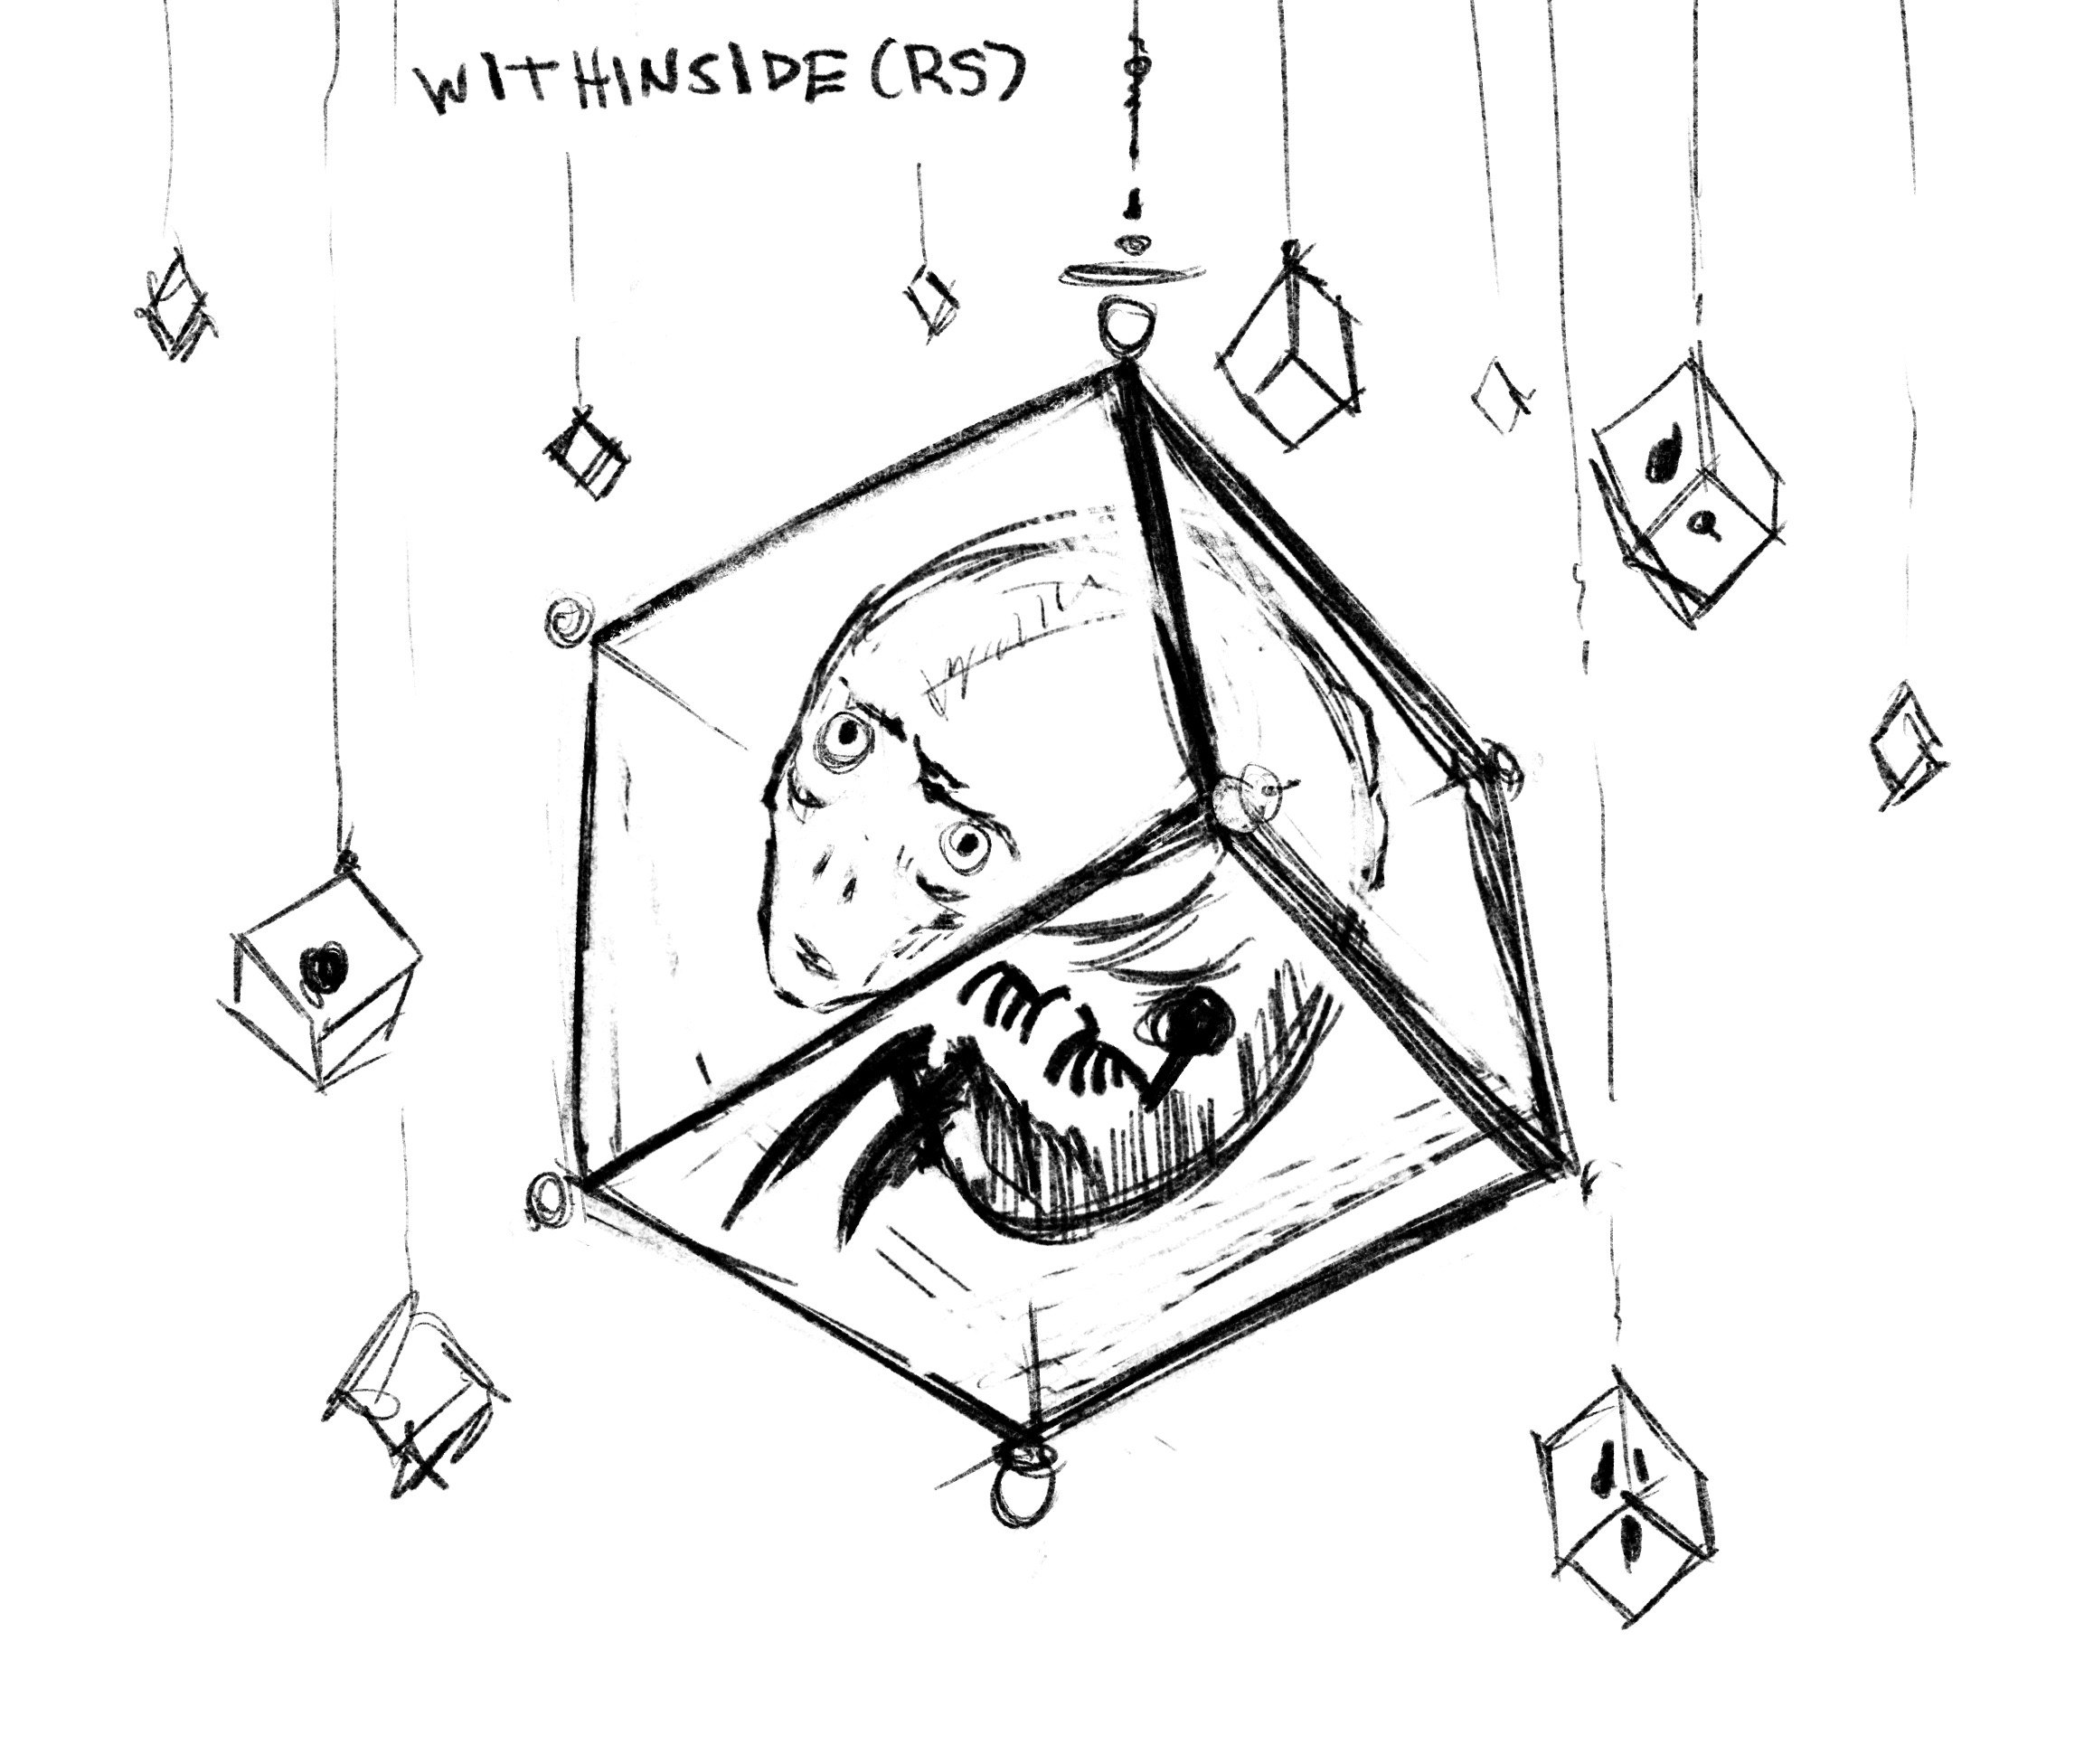 Procreate idea sketch on Ipad before any 3D work.